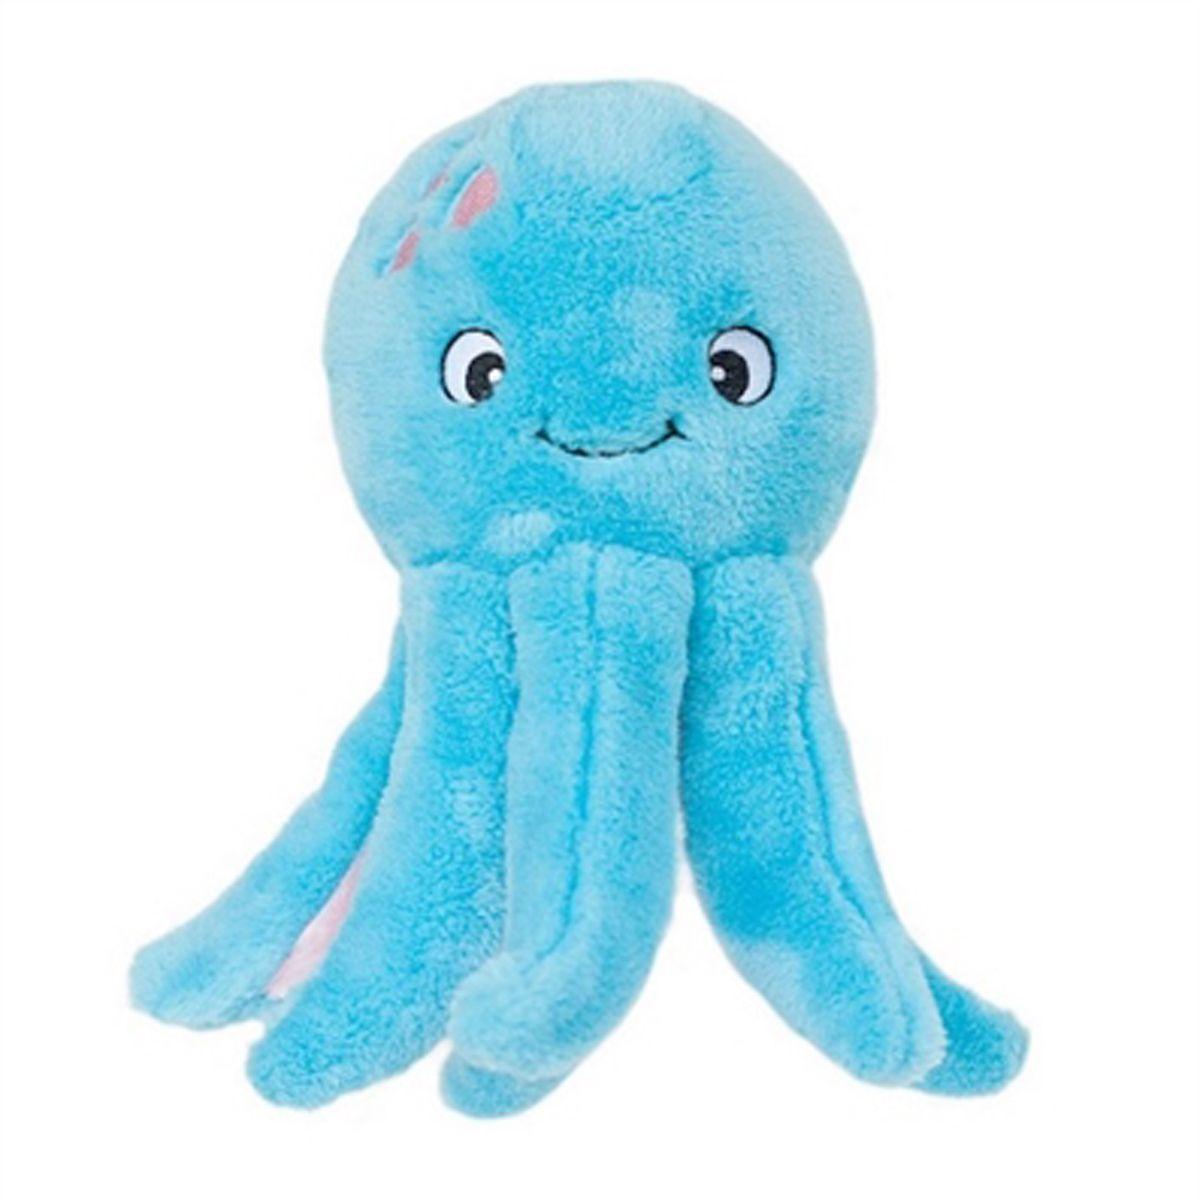 Grunterz Dog Toy Oscar The Octopus Dog Toys Dog Supplies Dog